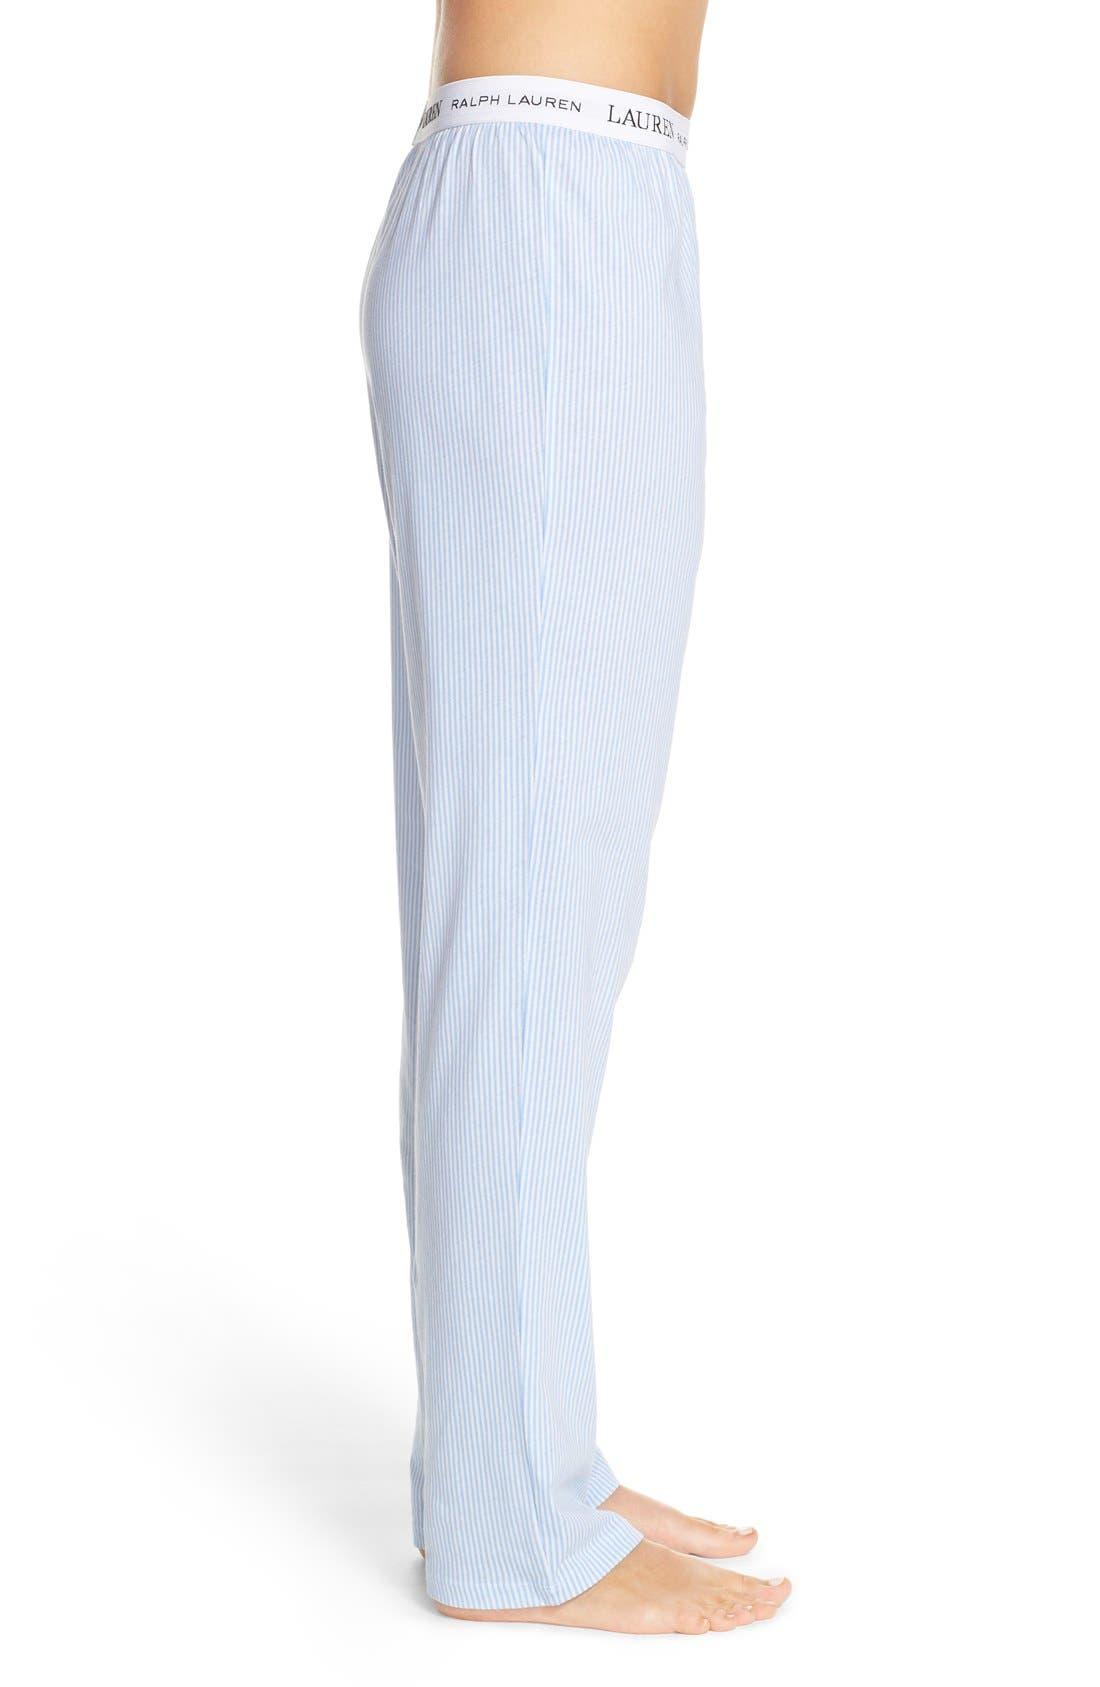 LAUREN RALPH LAUREN, Logo Waistband Lounge Pants, Alternate thumbnail 3, color, STRIPE PALE BLUE/ WHITE